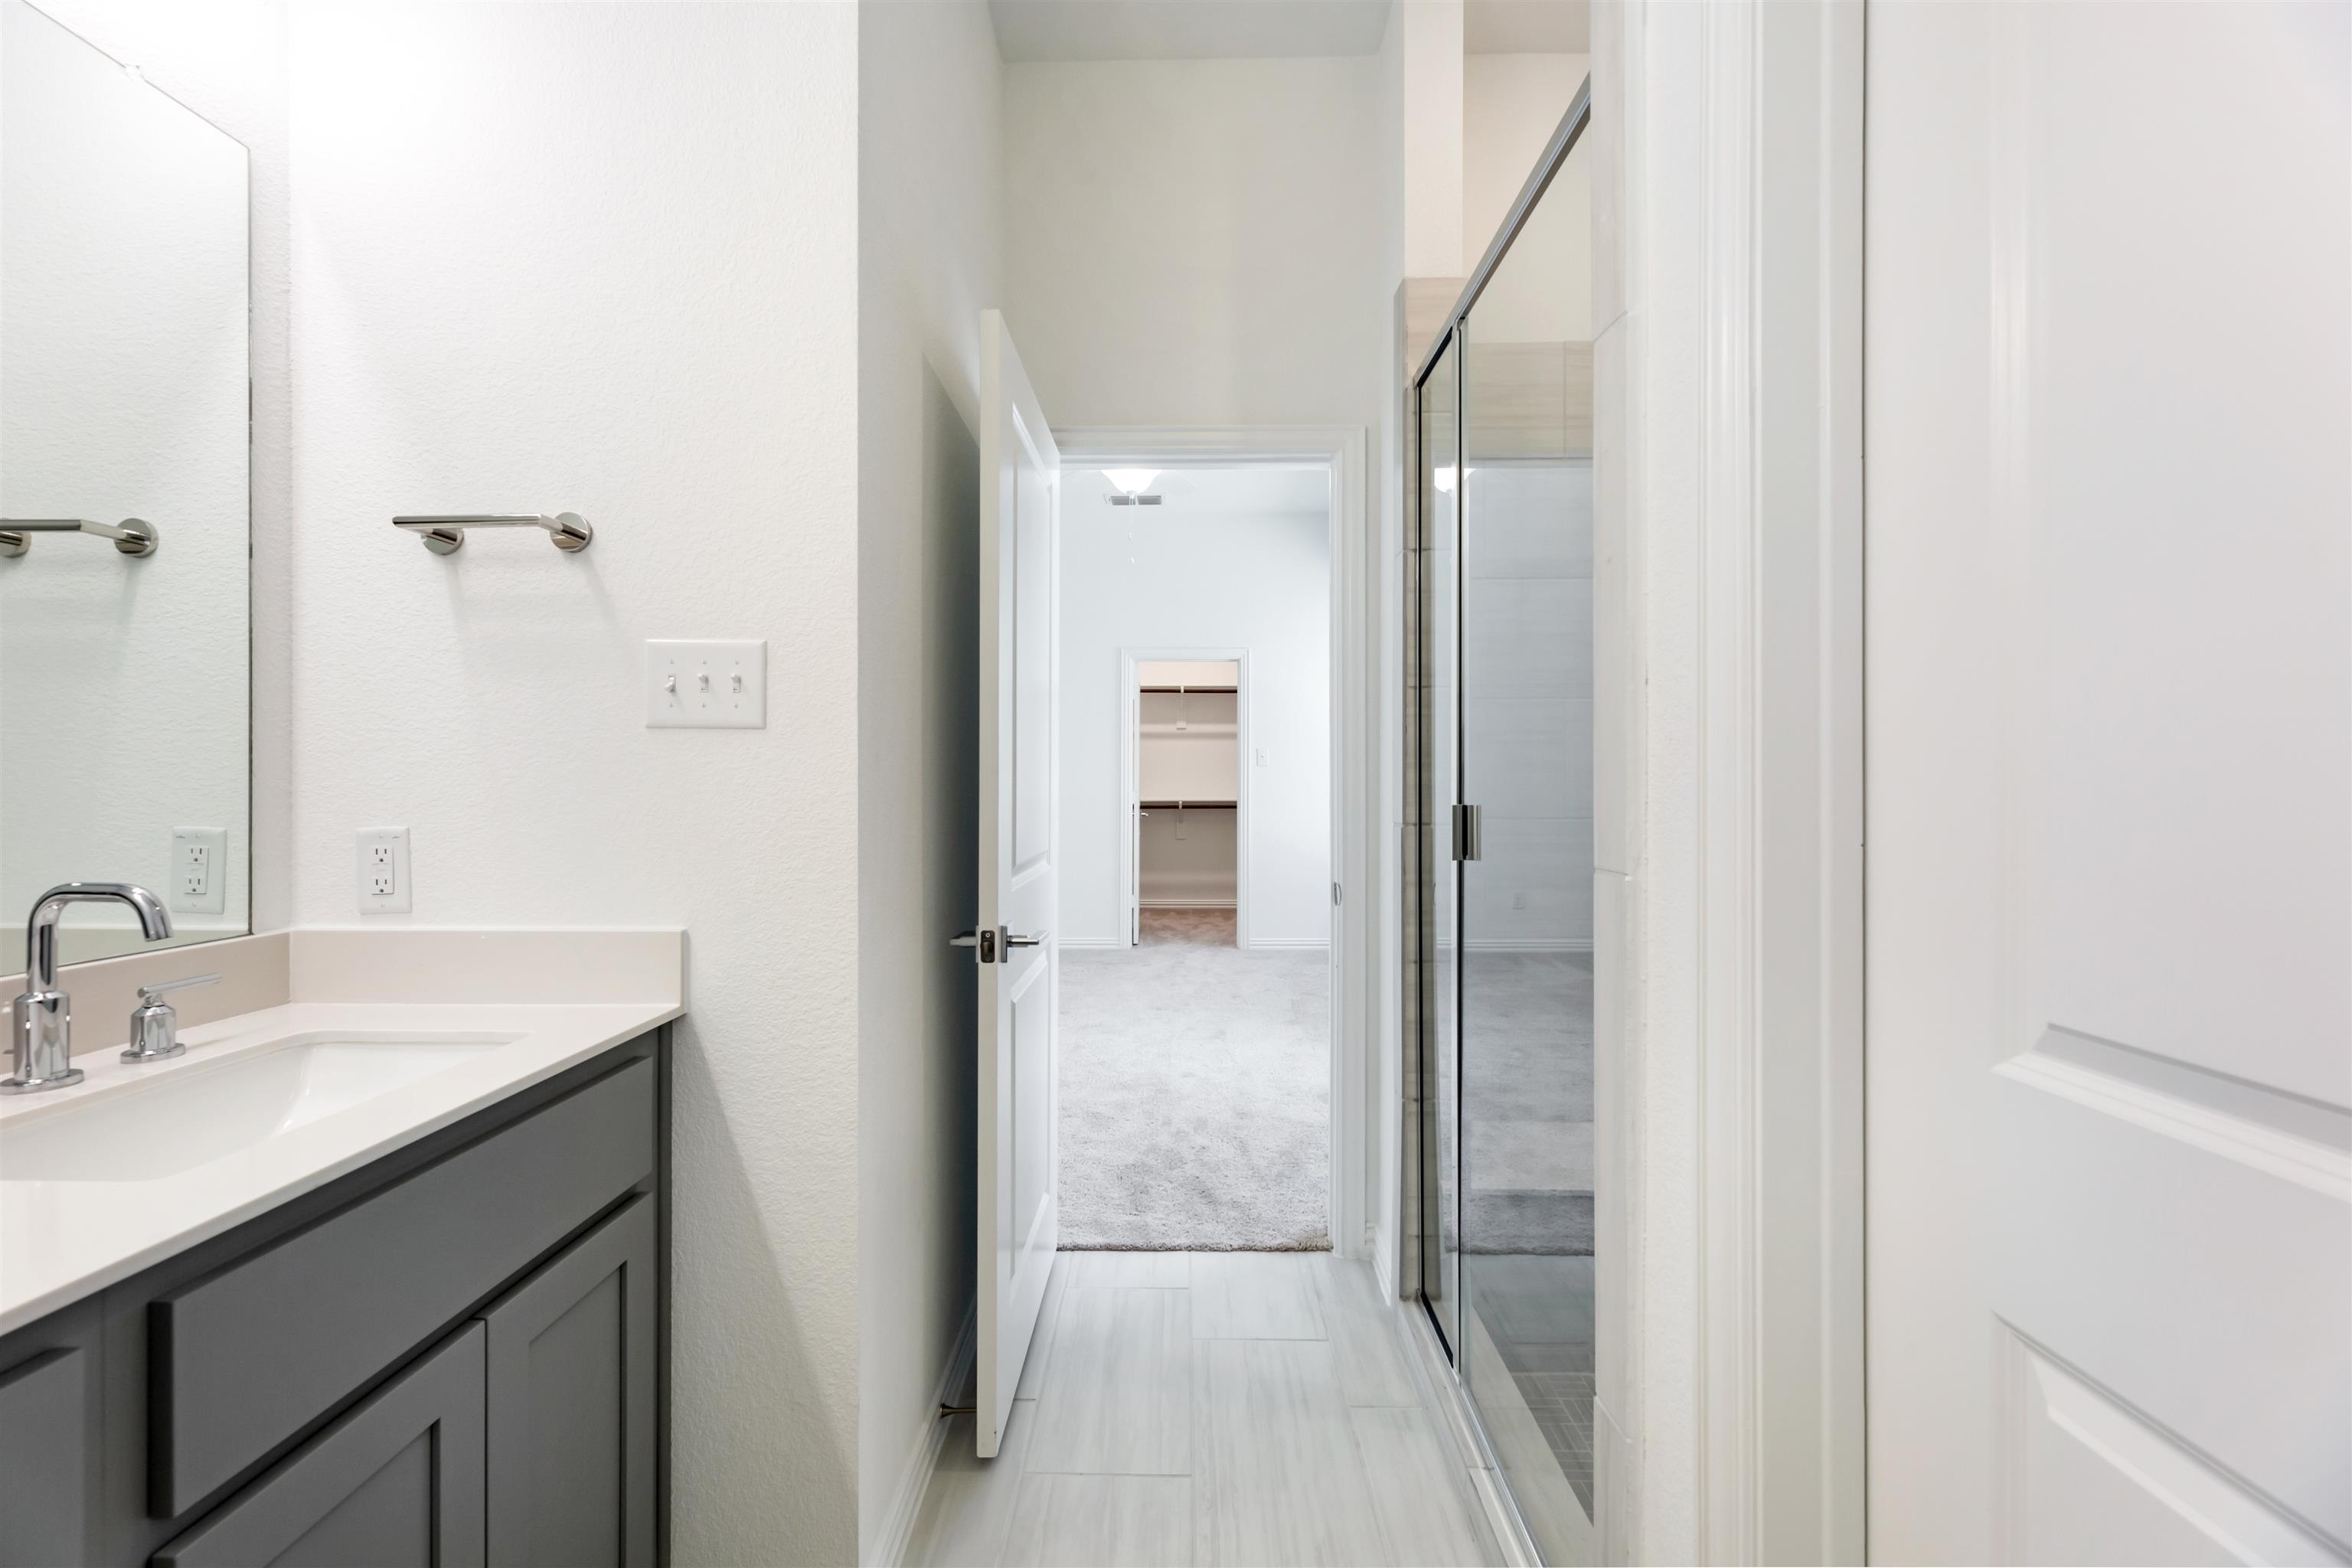 Bathroom featured in the Aubrey By Ashton Woods in Dallas, TX